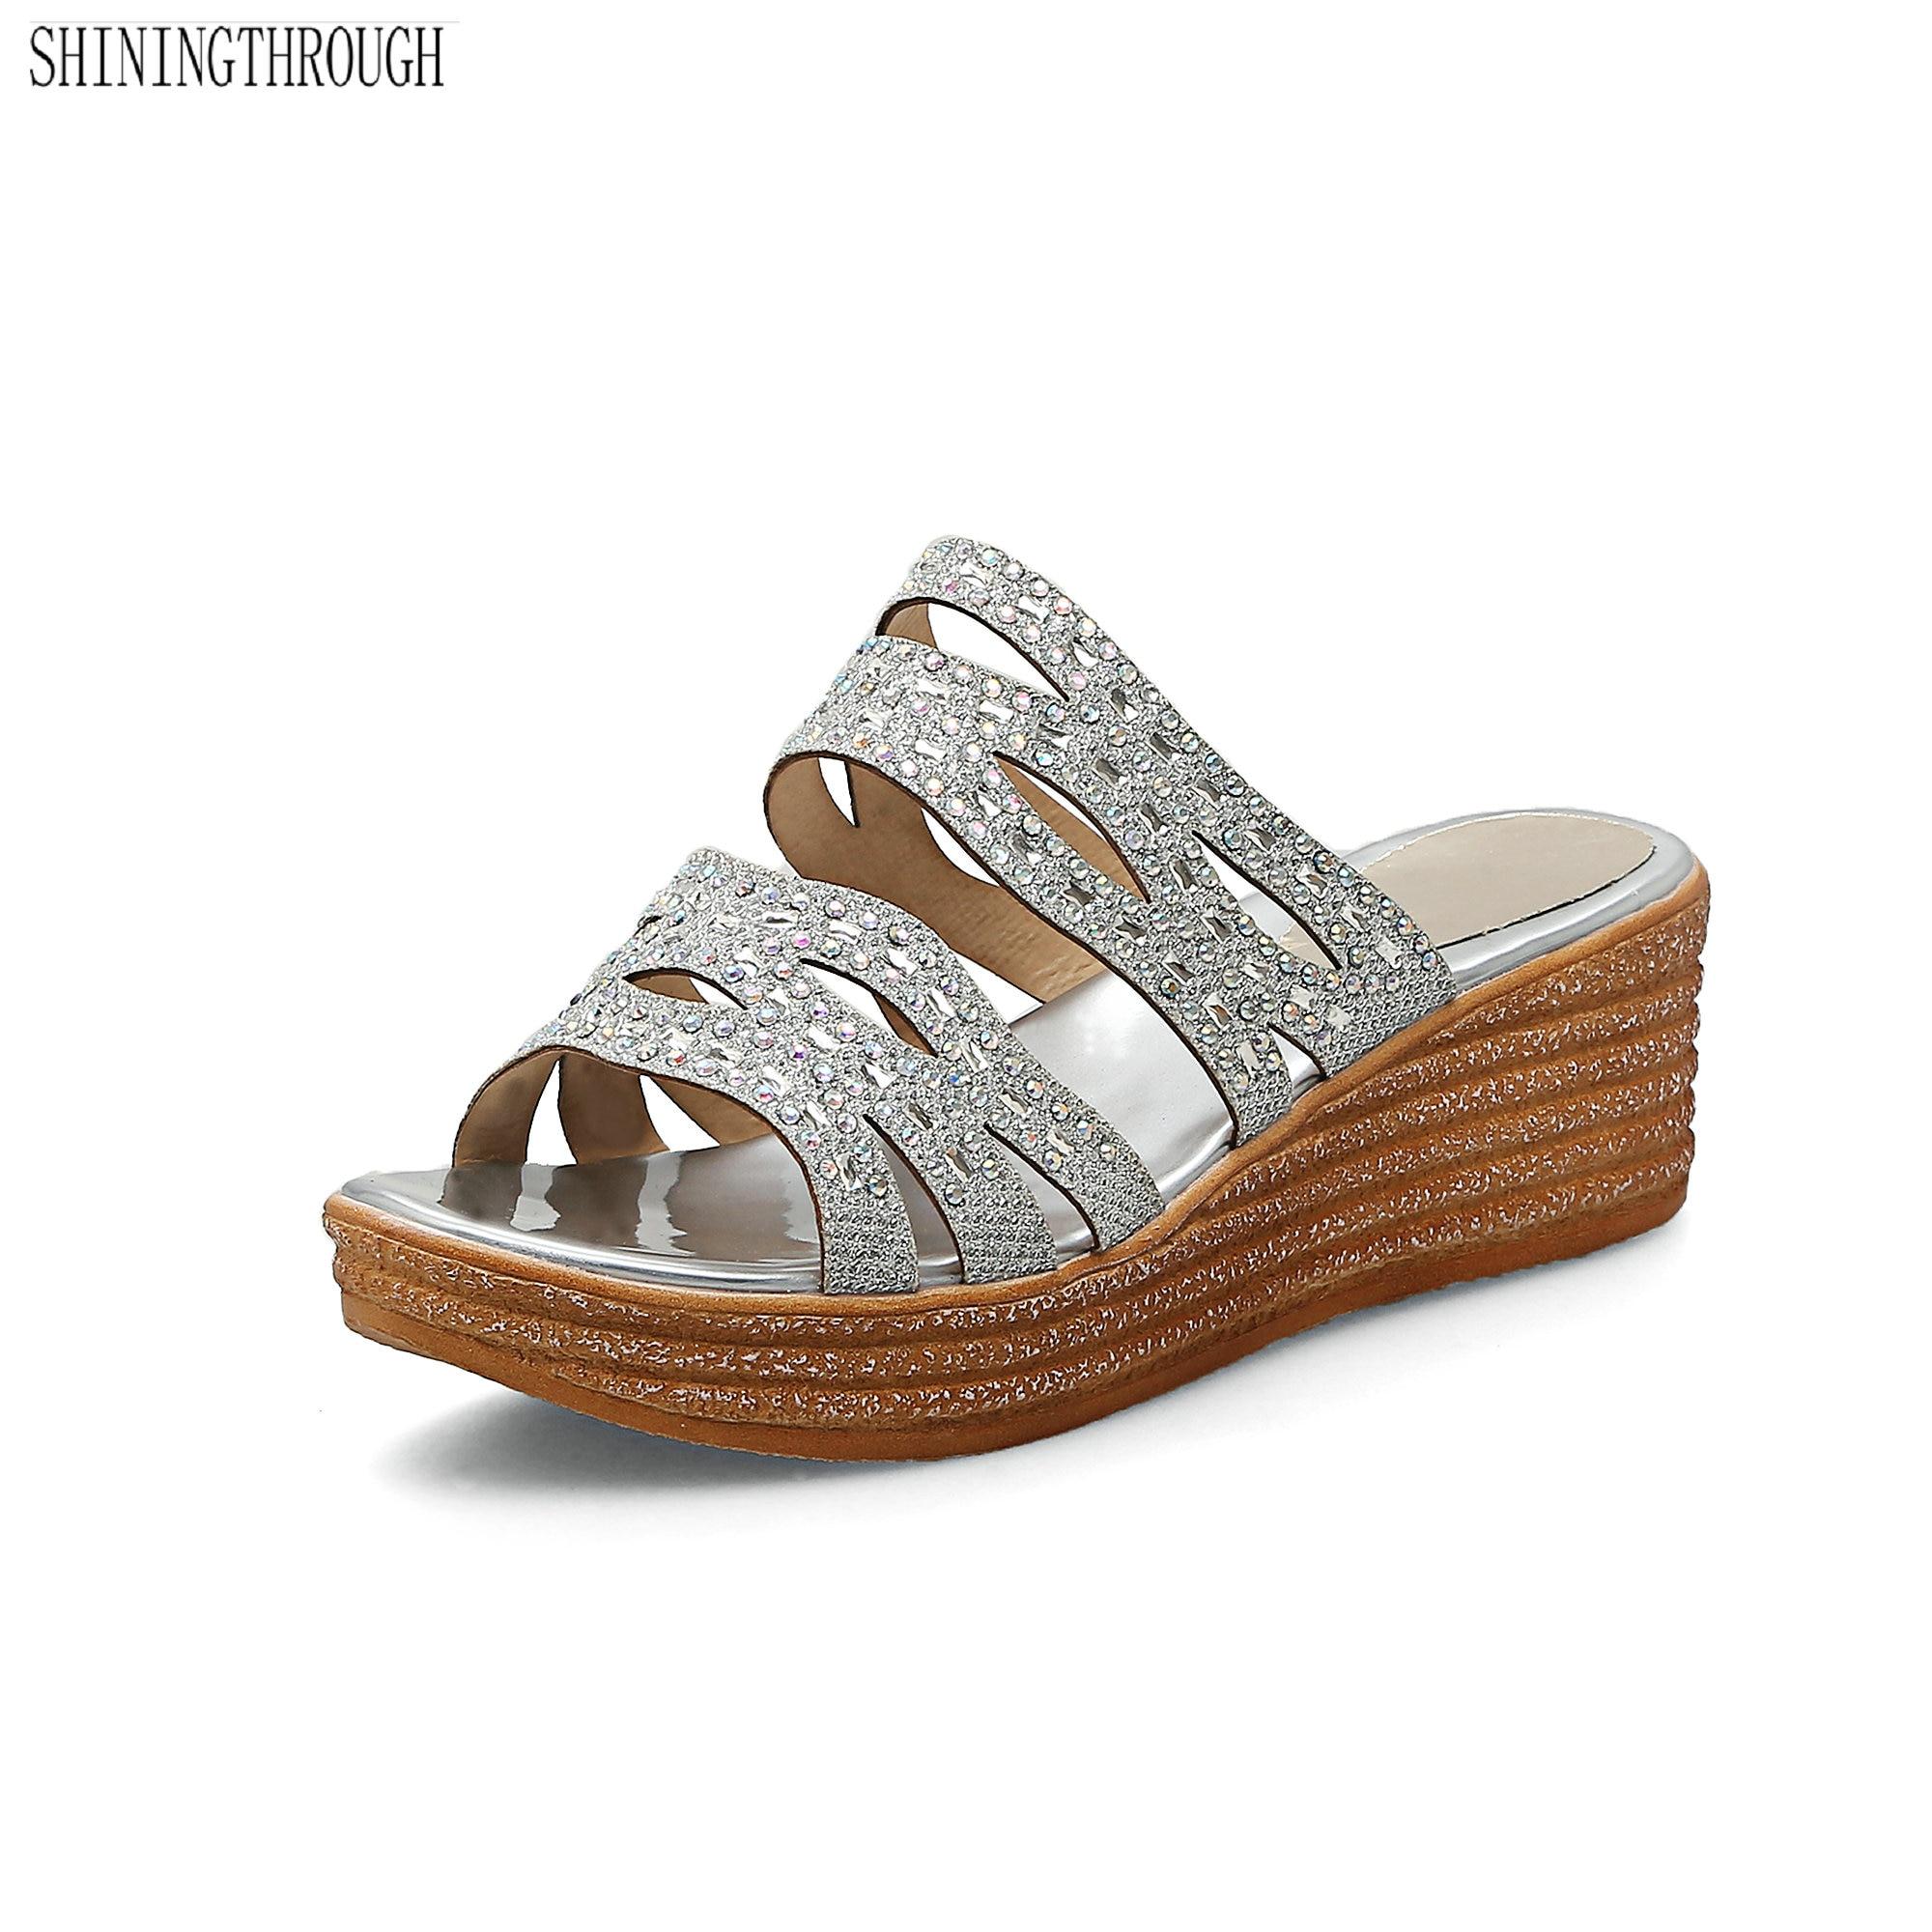 2018 sandals Women wedges sandals crystal high heels sandals summer shoes Casual platform shoes woman ruru15070 to 218